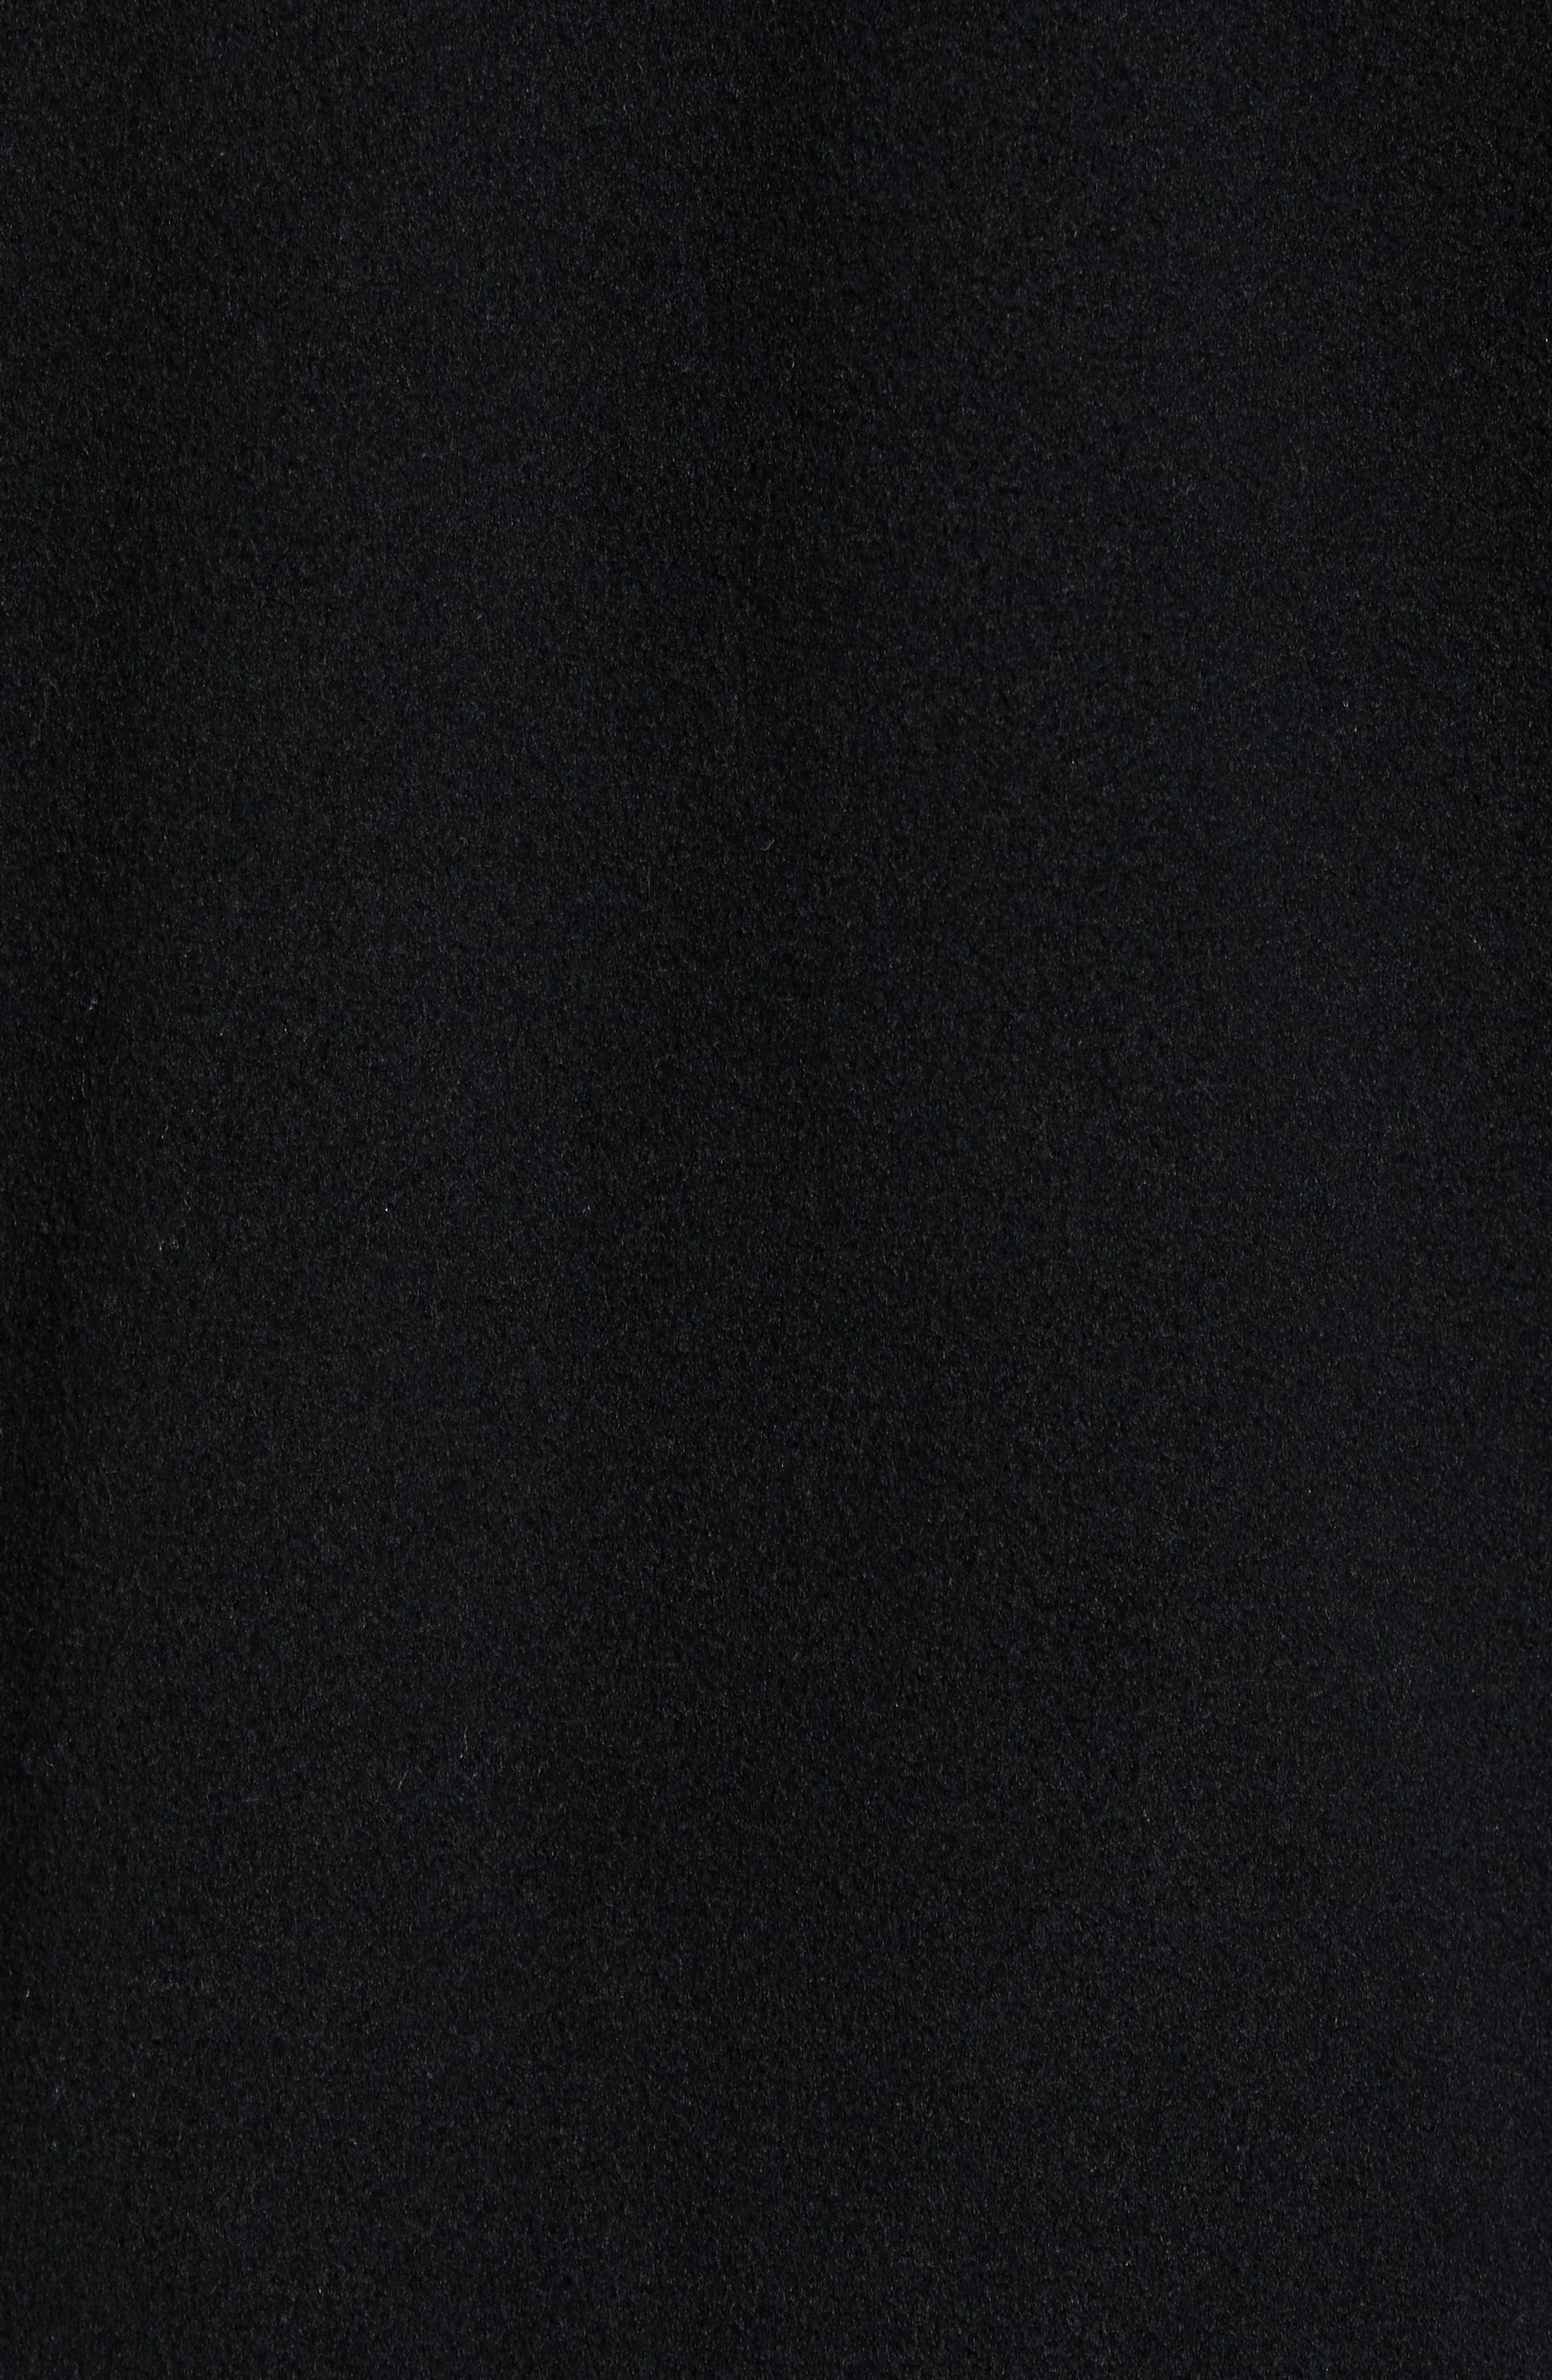 Denali 2 Polartec<sup>®</sup> Fleece Hoodie,                             Alternate thumbnail 5, color,                             Black